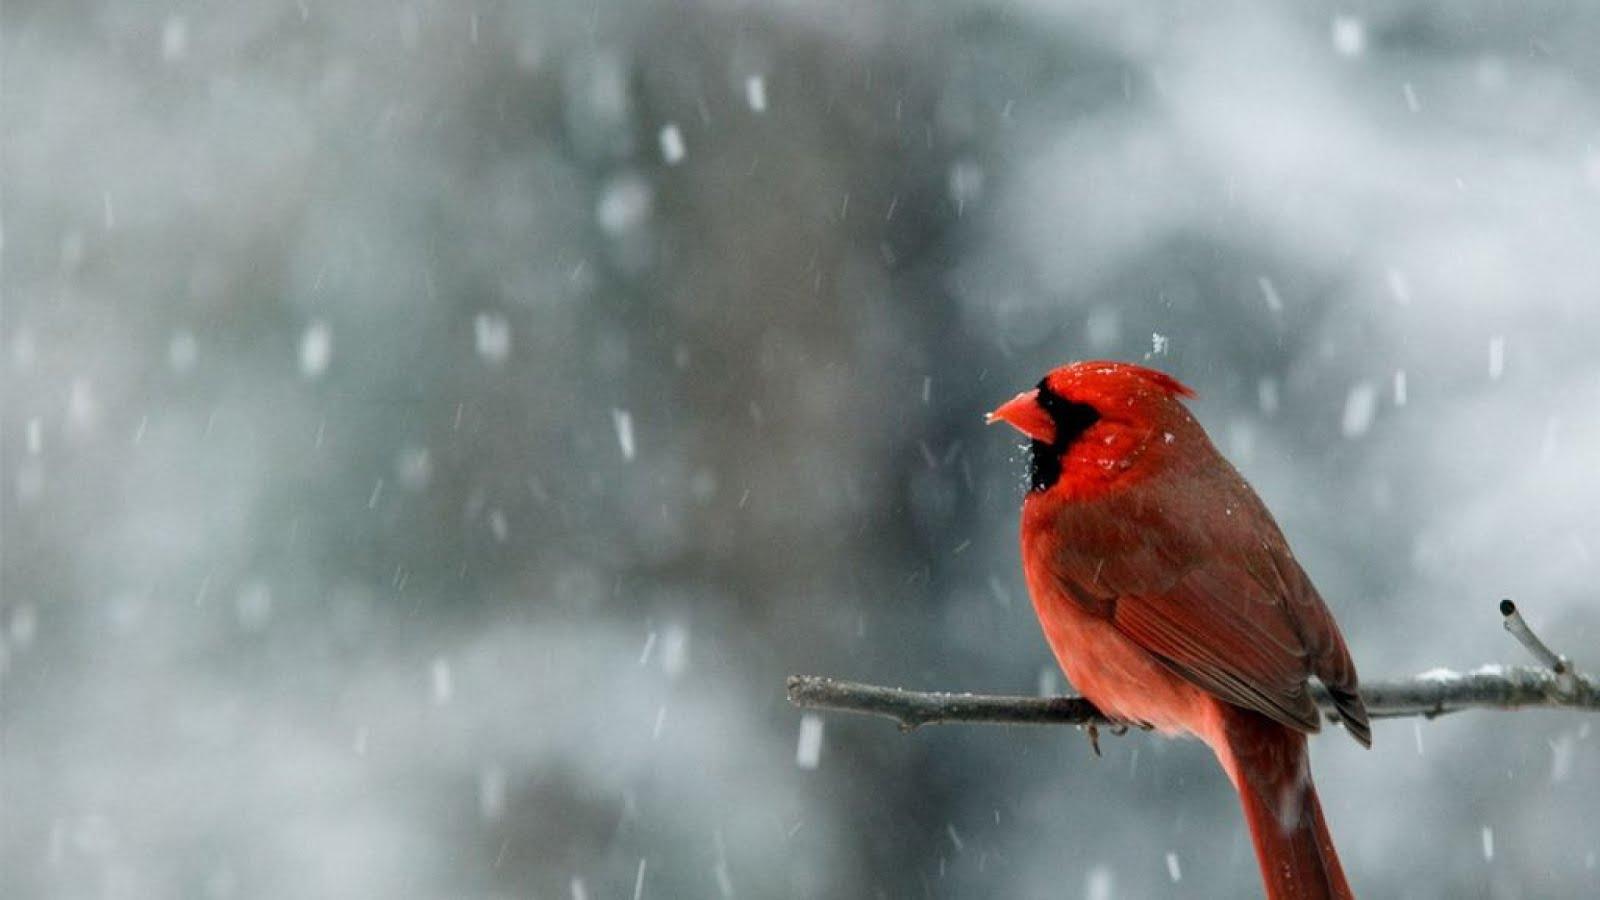 Falling Snow Wallpaper Widescreen